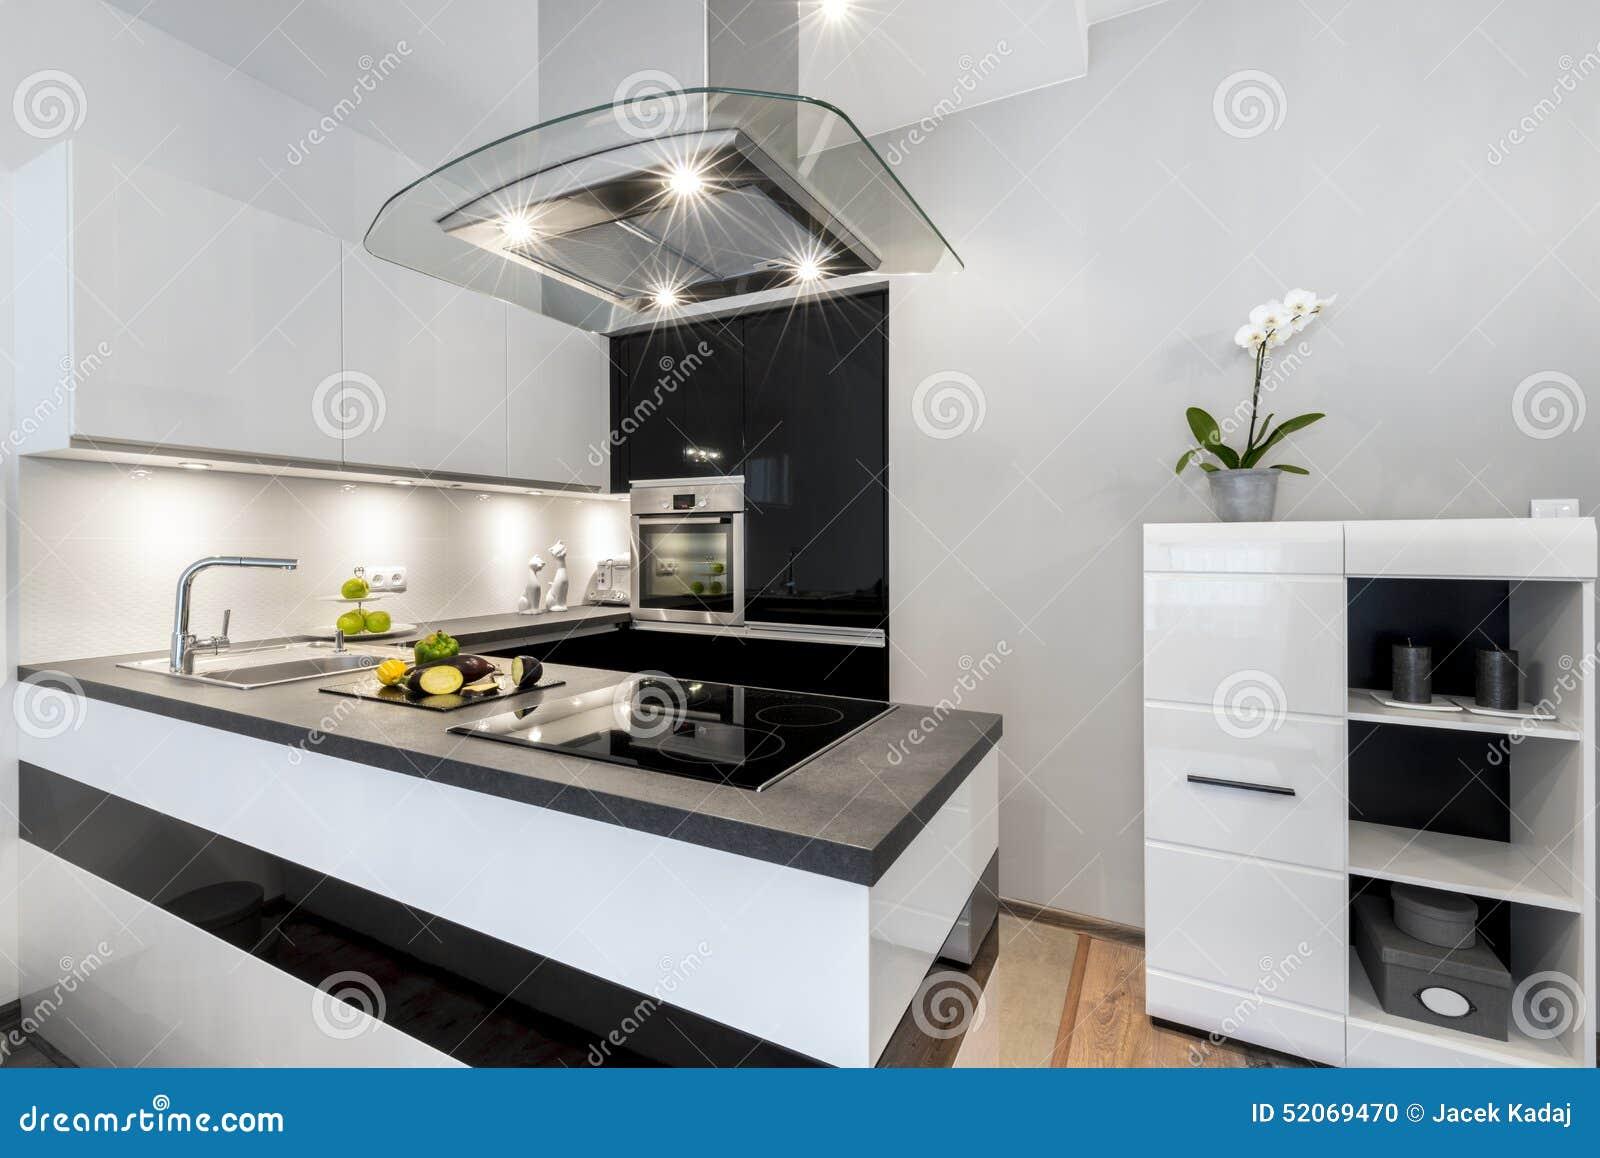 Black And White Kitchen Modern Interior Design Stock Photo Image 52069470